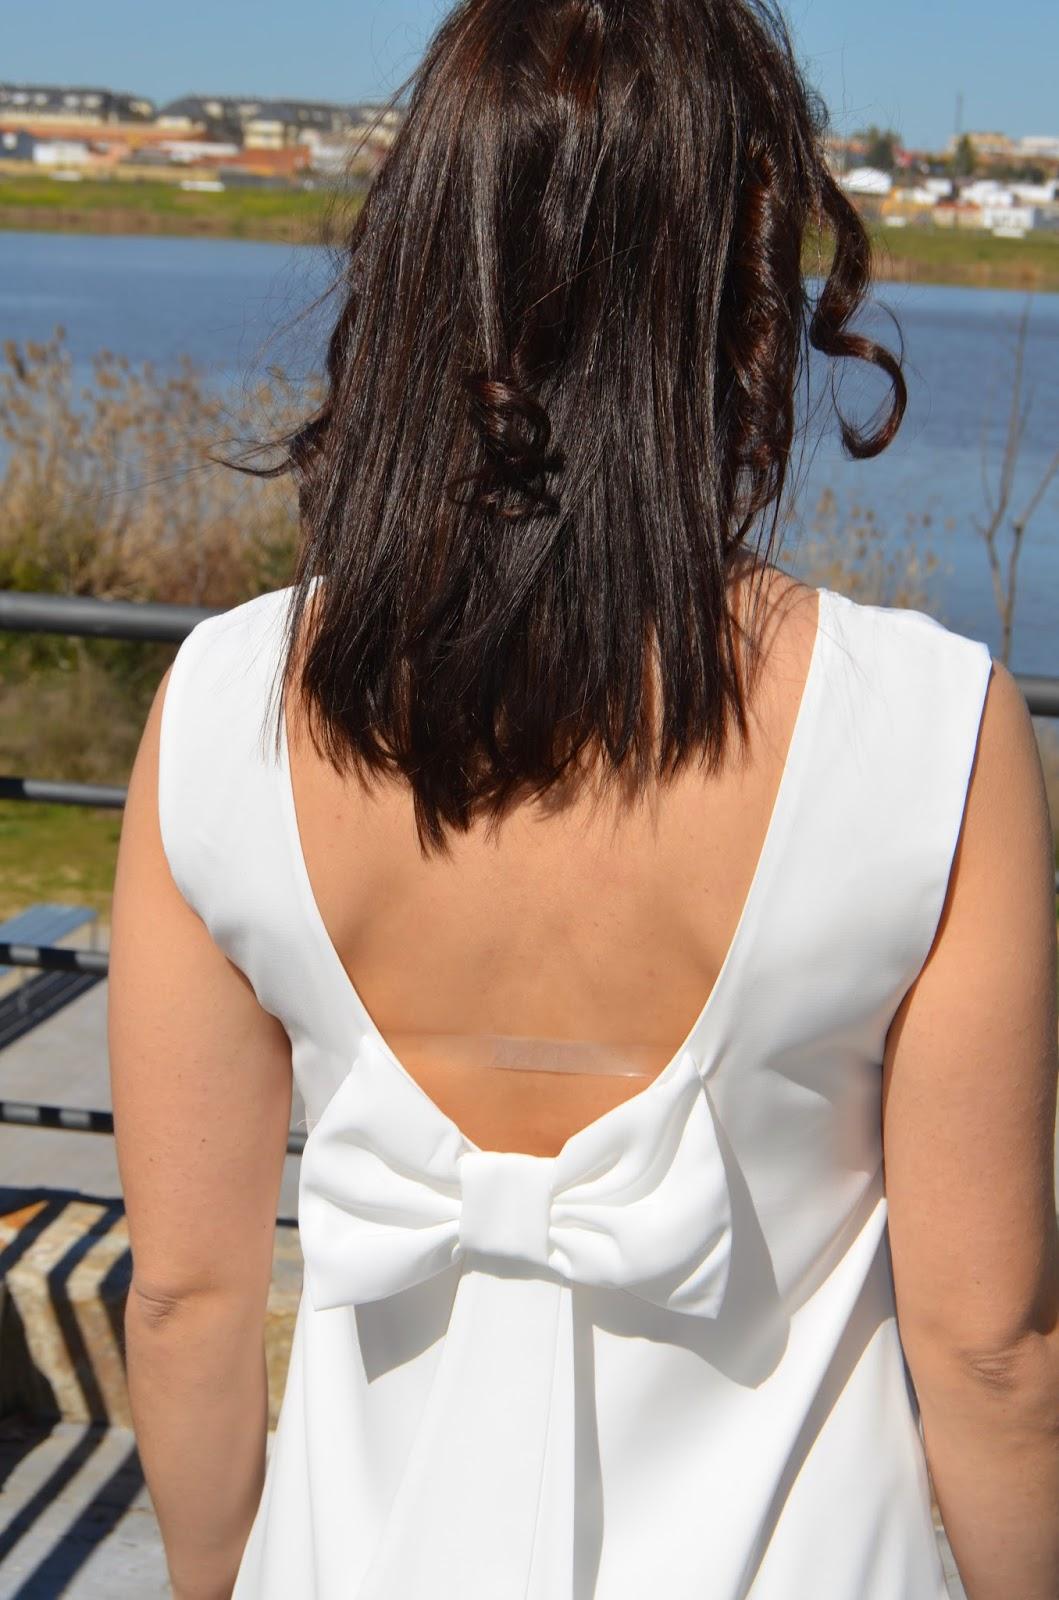 vestido_ibicenco_mibolsillodetrapillo_ajuarela_vestidoparacomunion